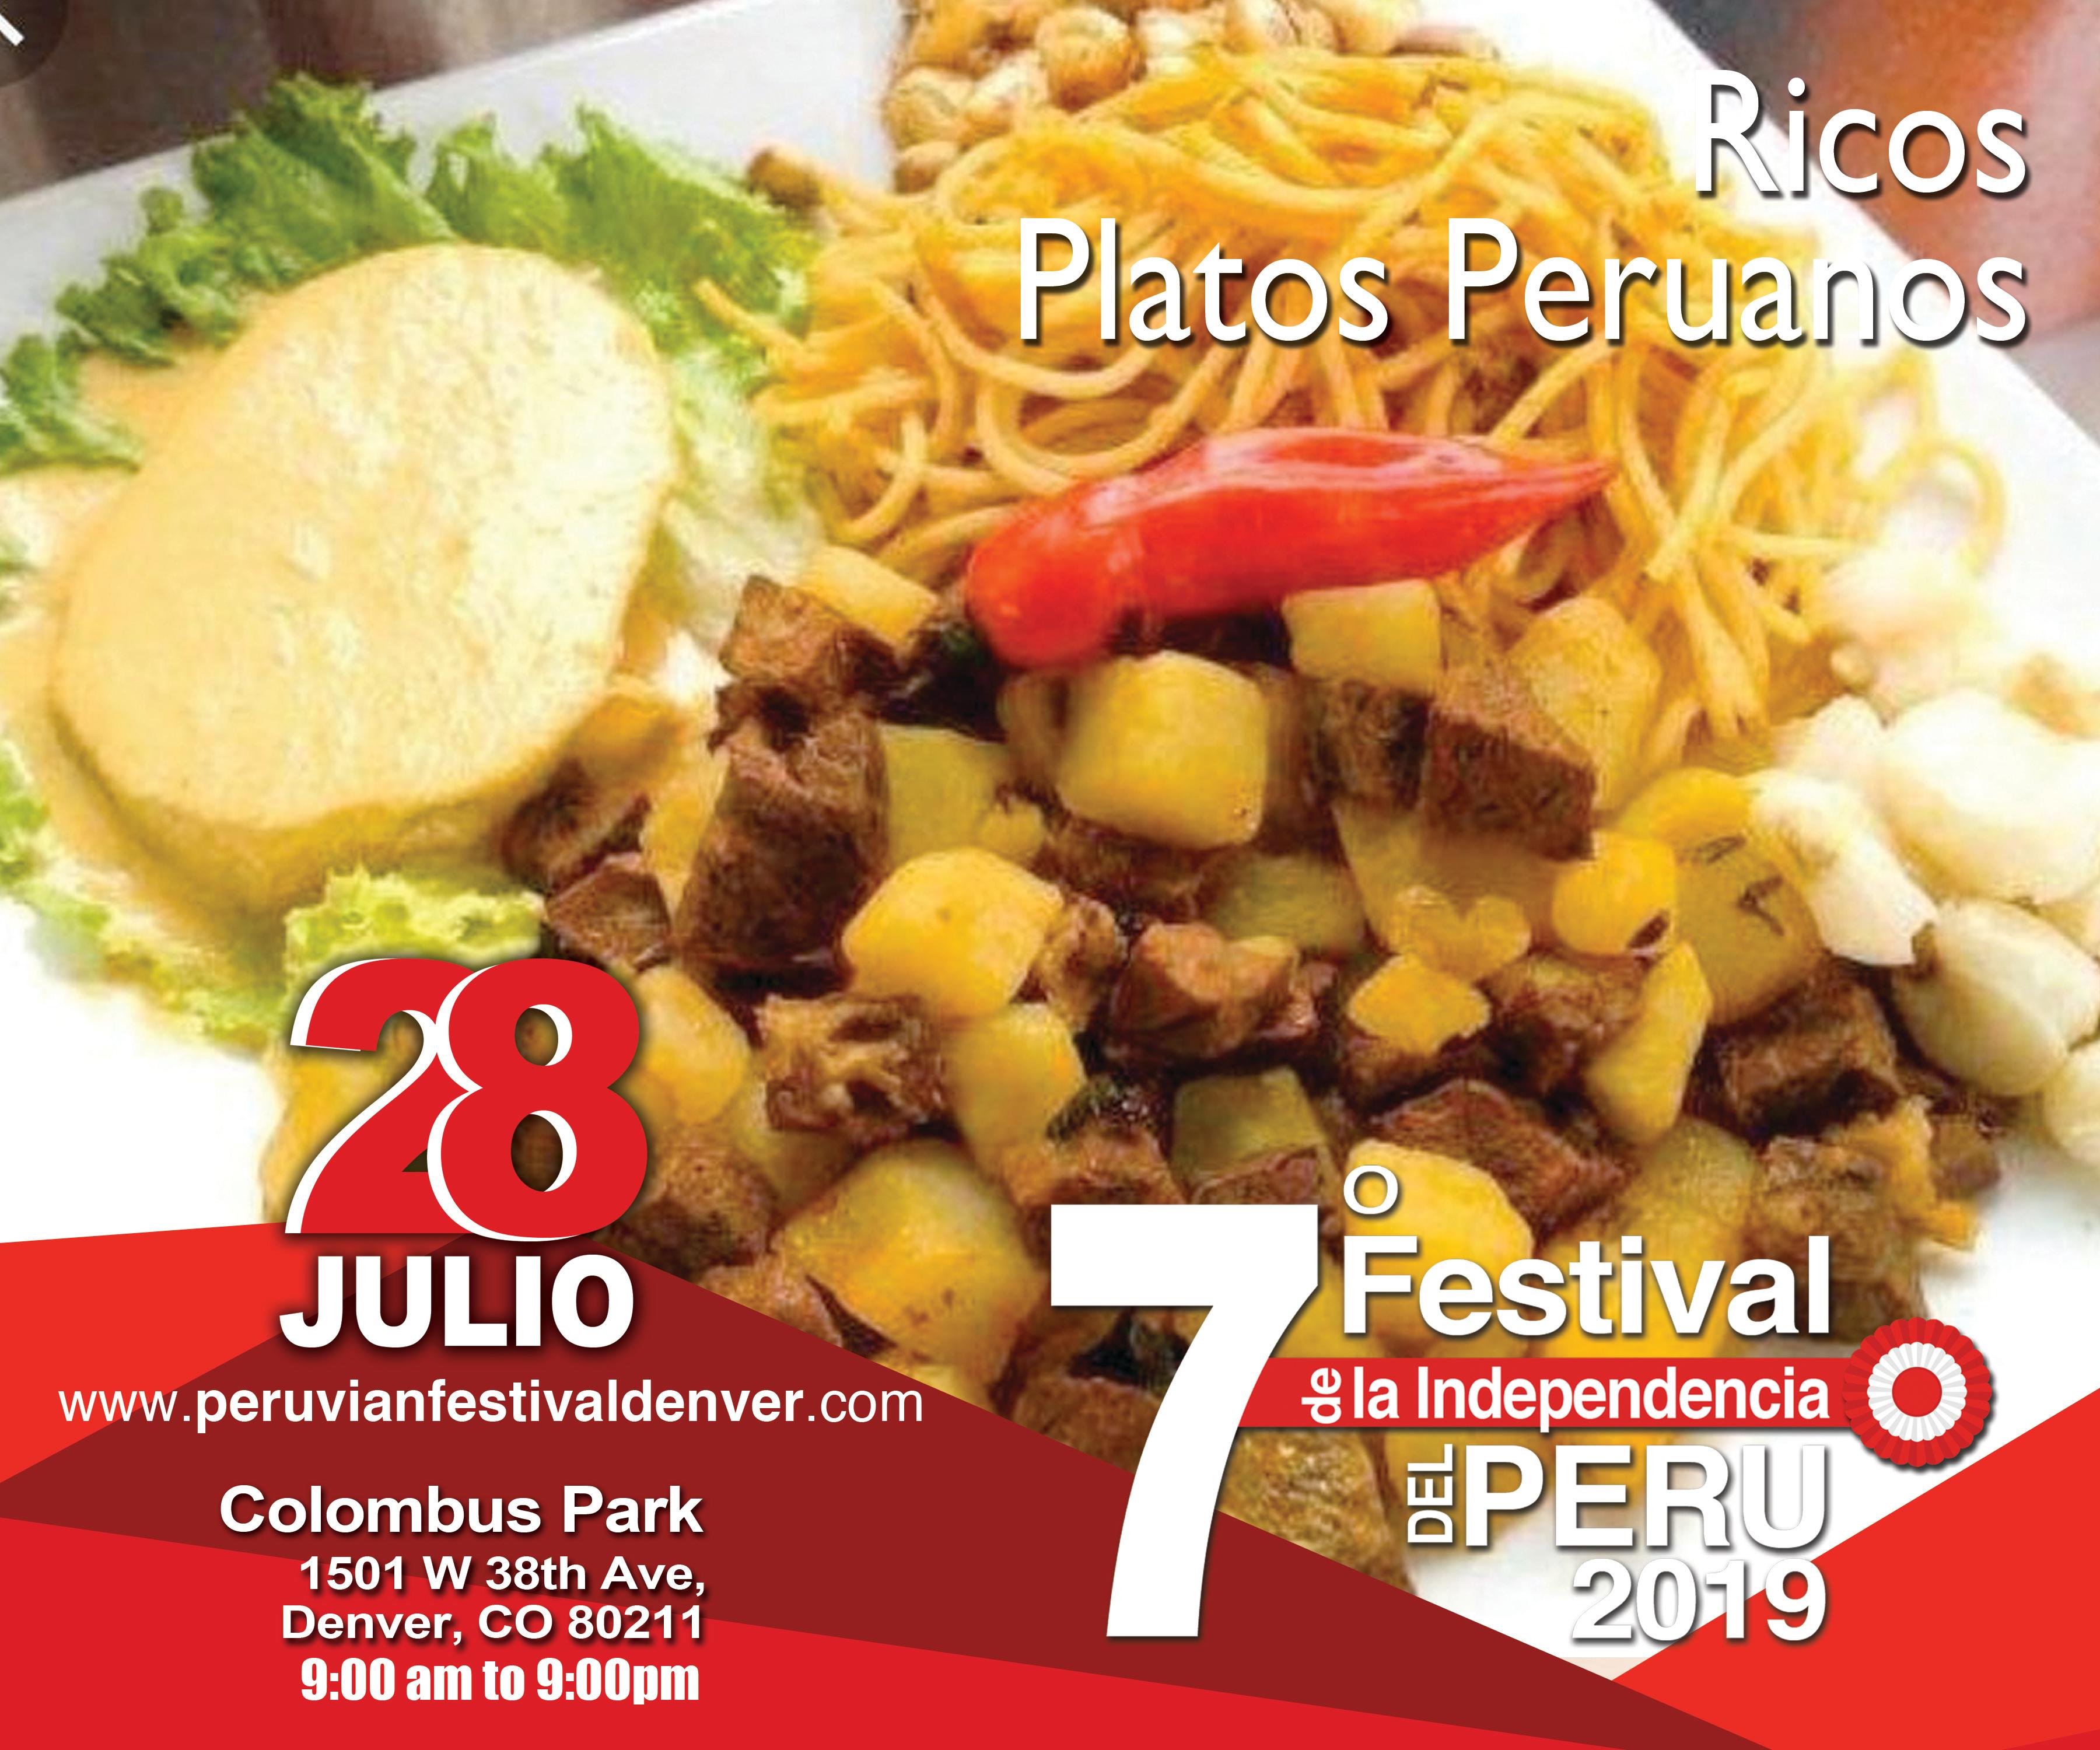 platos-peruanos-1